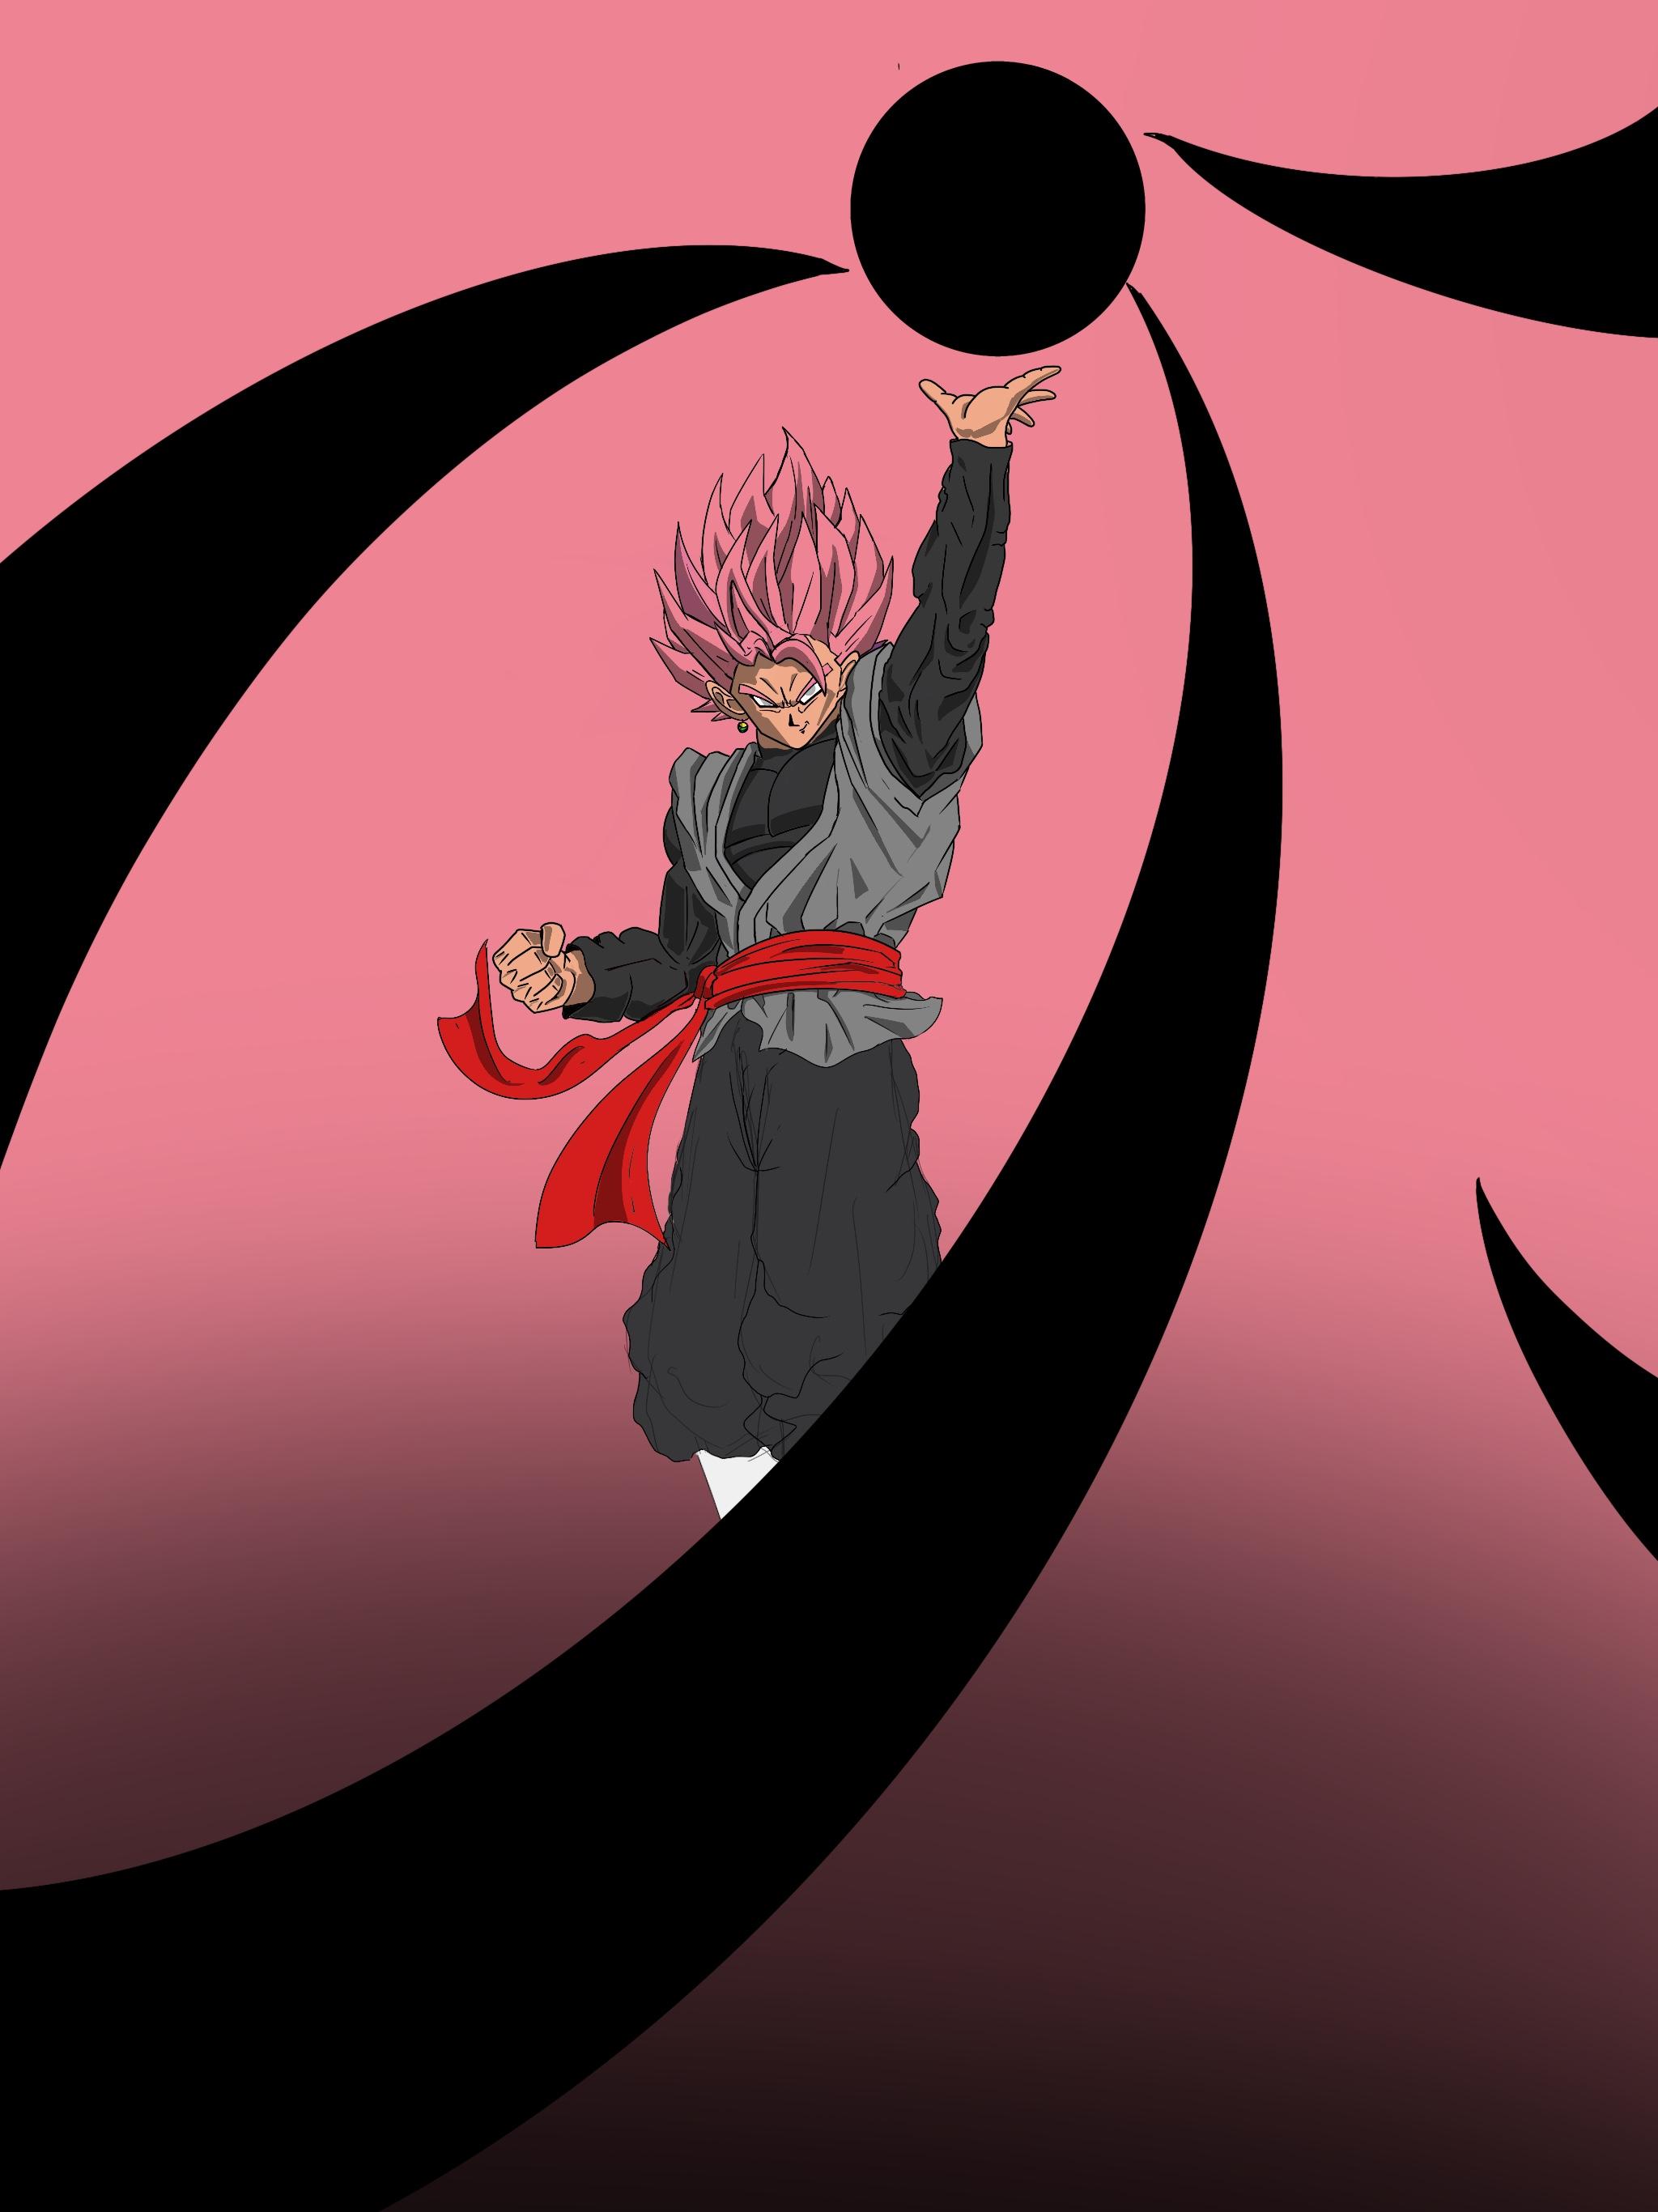 Wallpaper Dragon Ball Super Black Goku Pink Bow Super